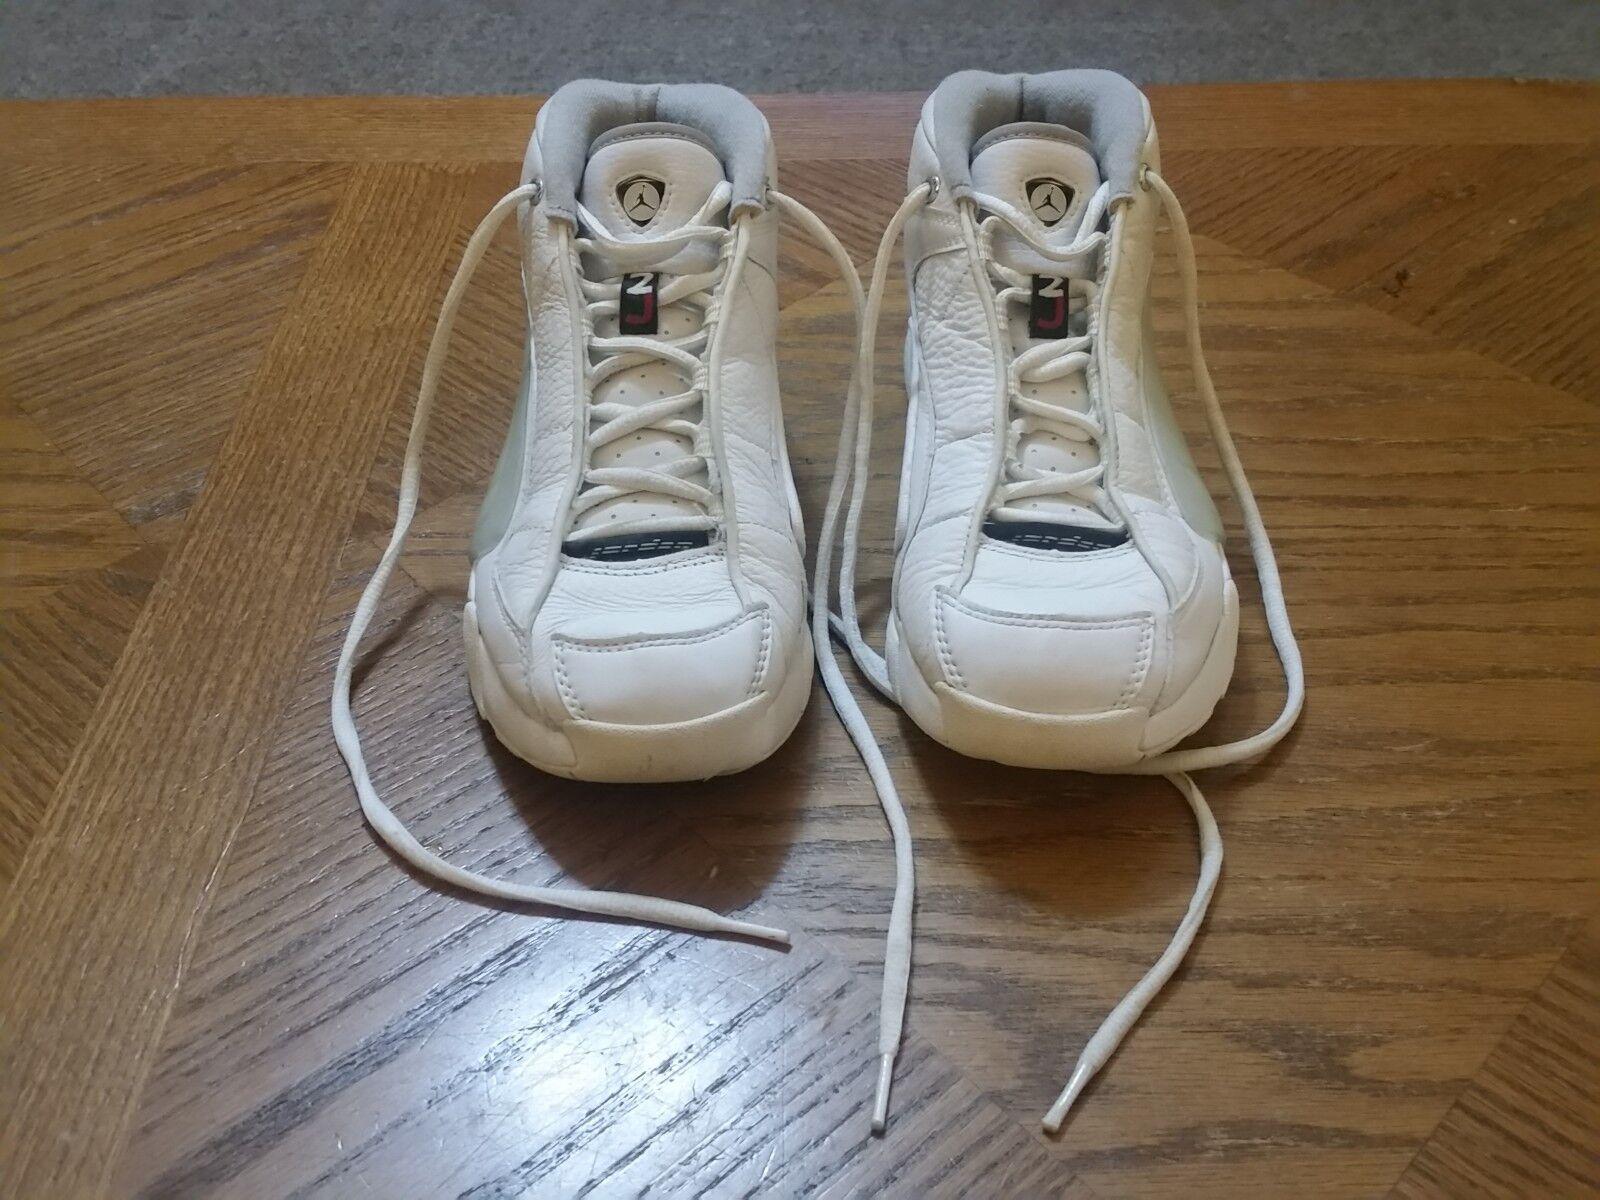 NIKE Jumpman DJ Air Jordan Shoes 136056  111 Size 8